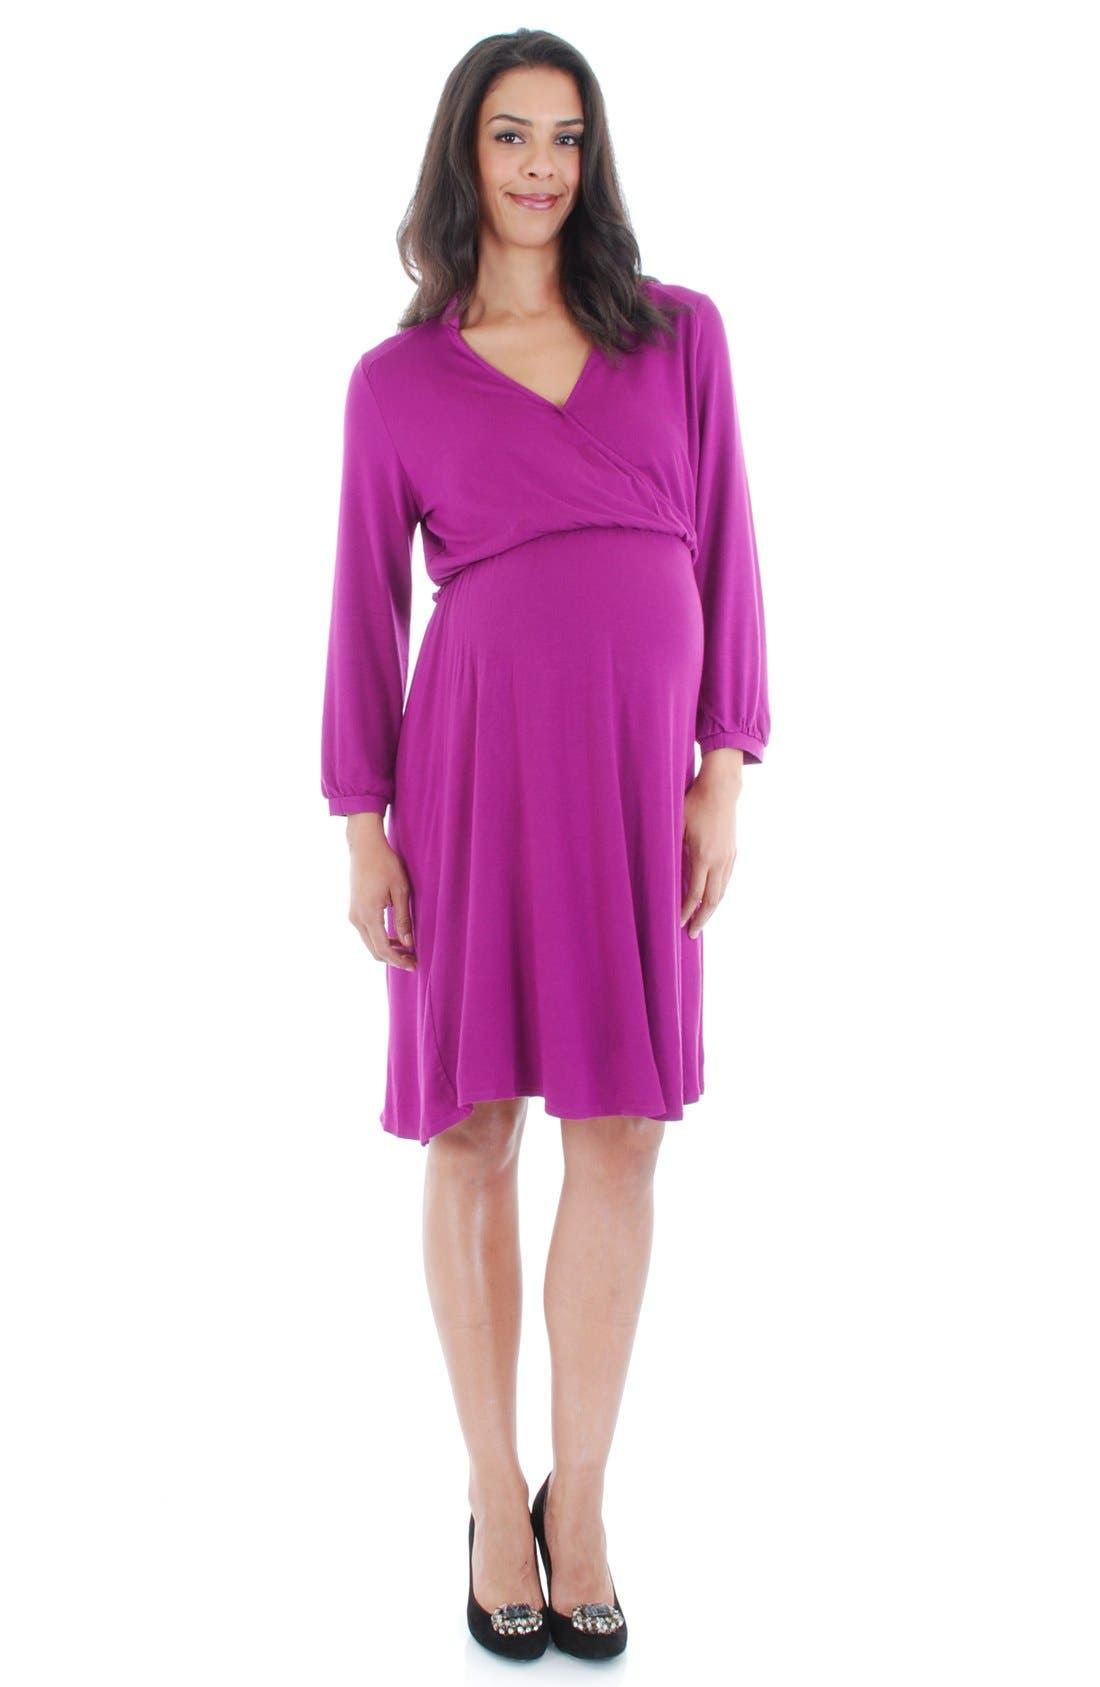 EverlyGrey 'Sicily' Maternity/Nursing Dress,                         Main,                         color,